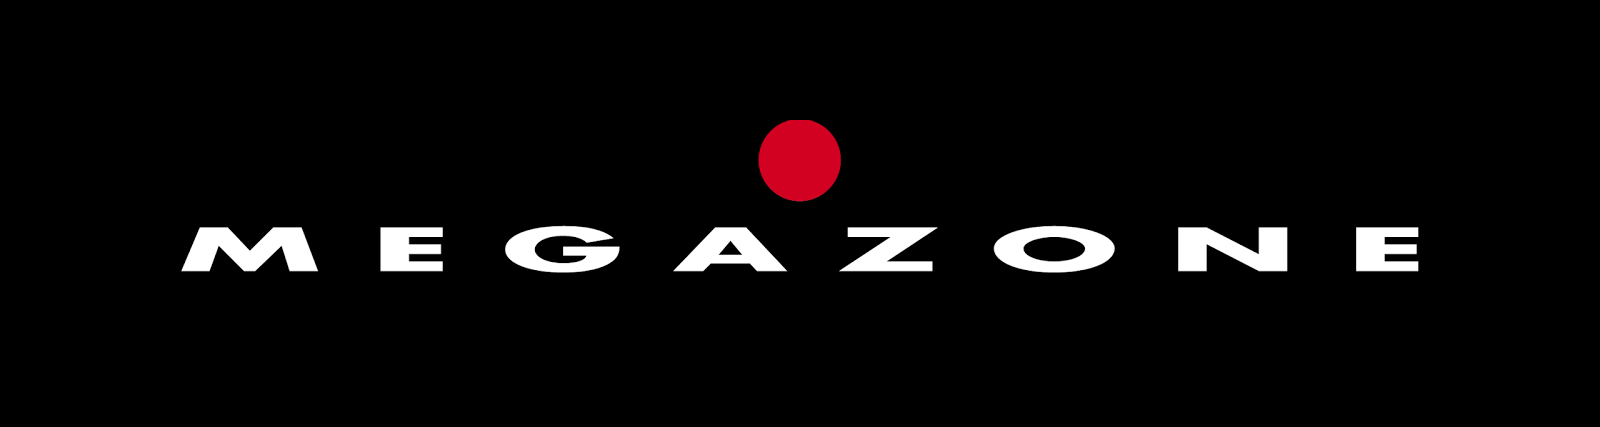 megazone_logo